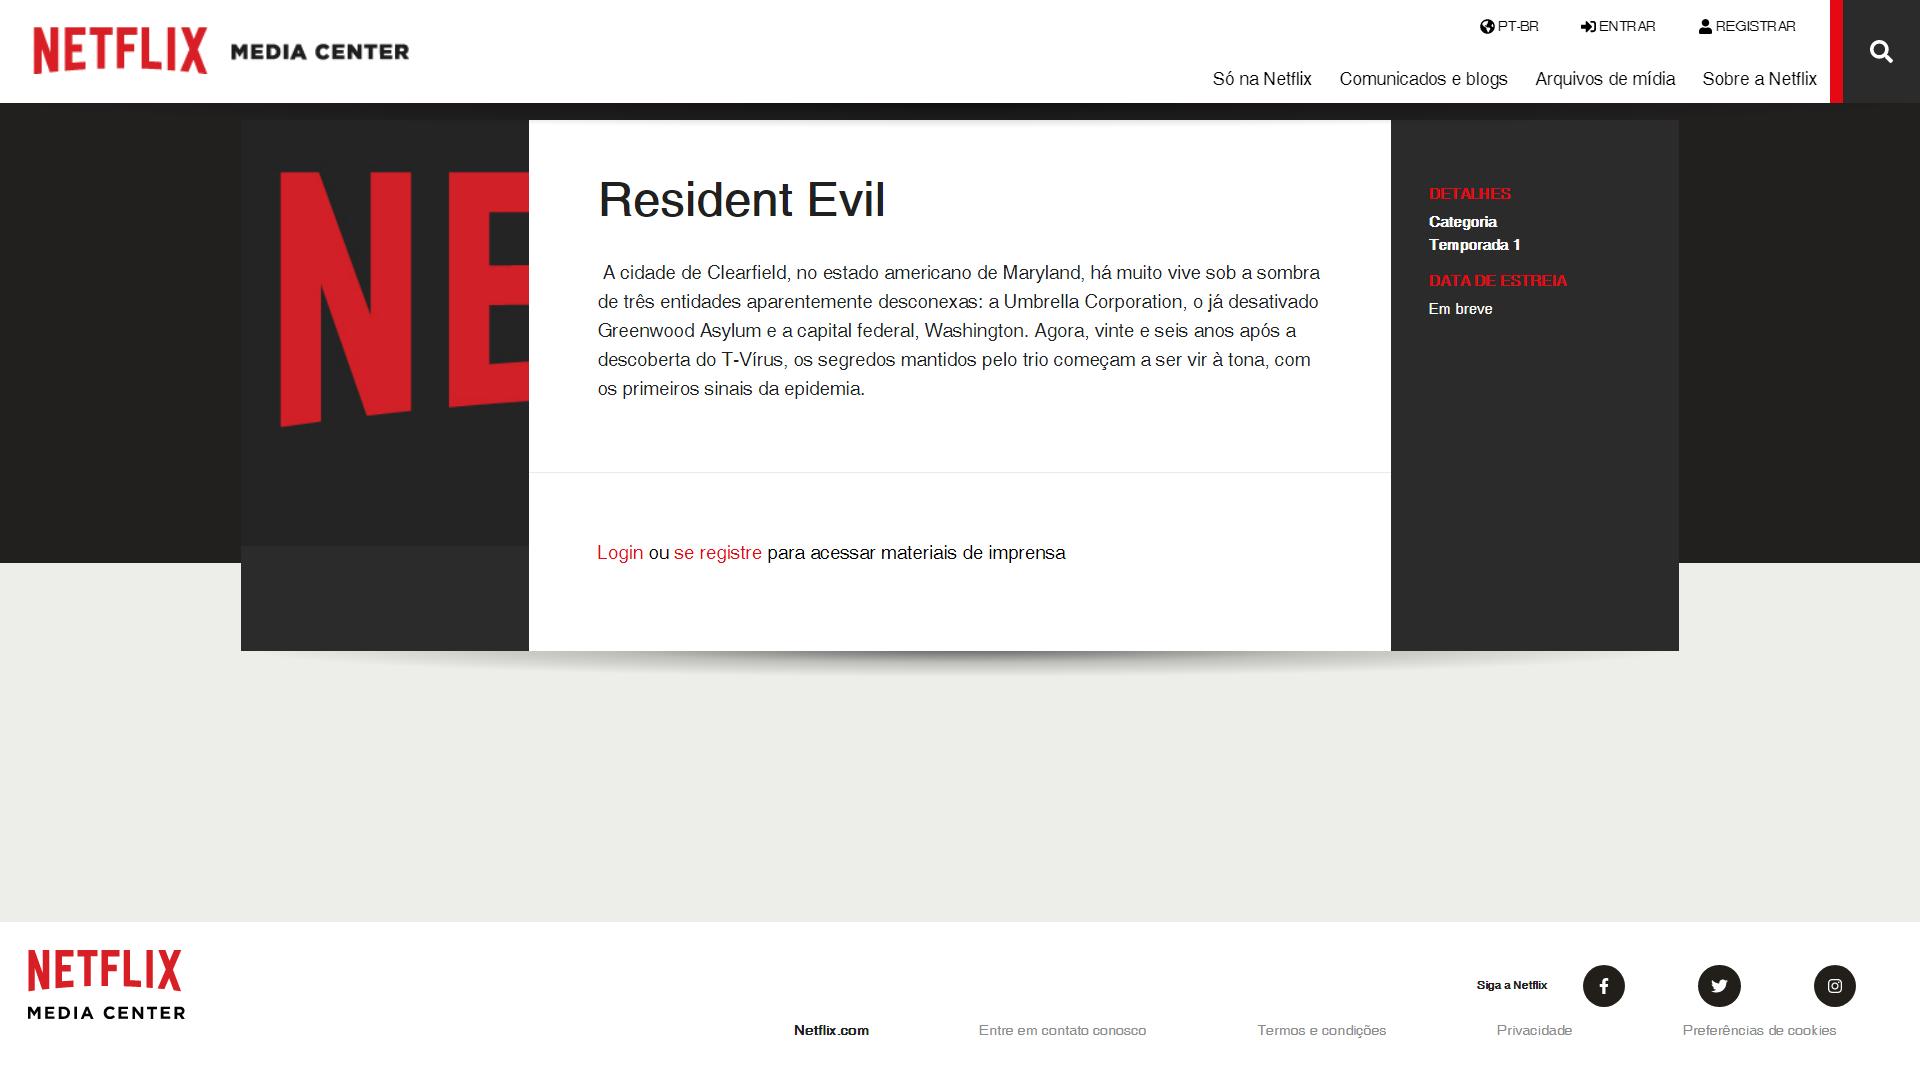 netflix-resident-evil-sinopse.png